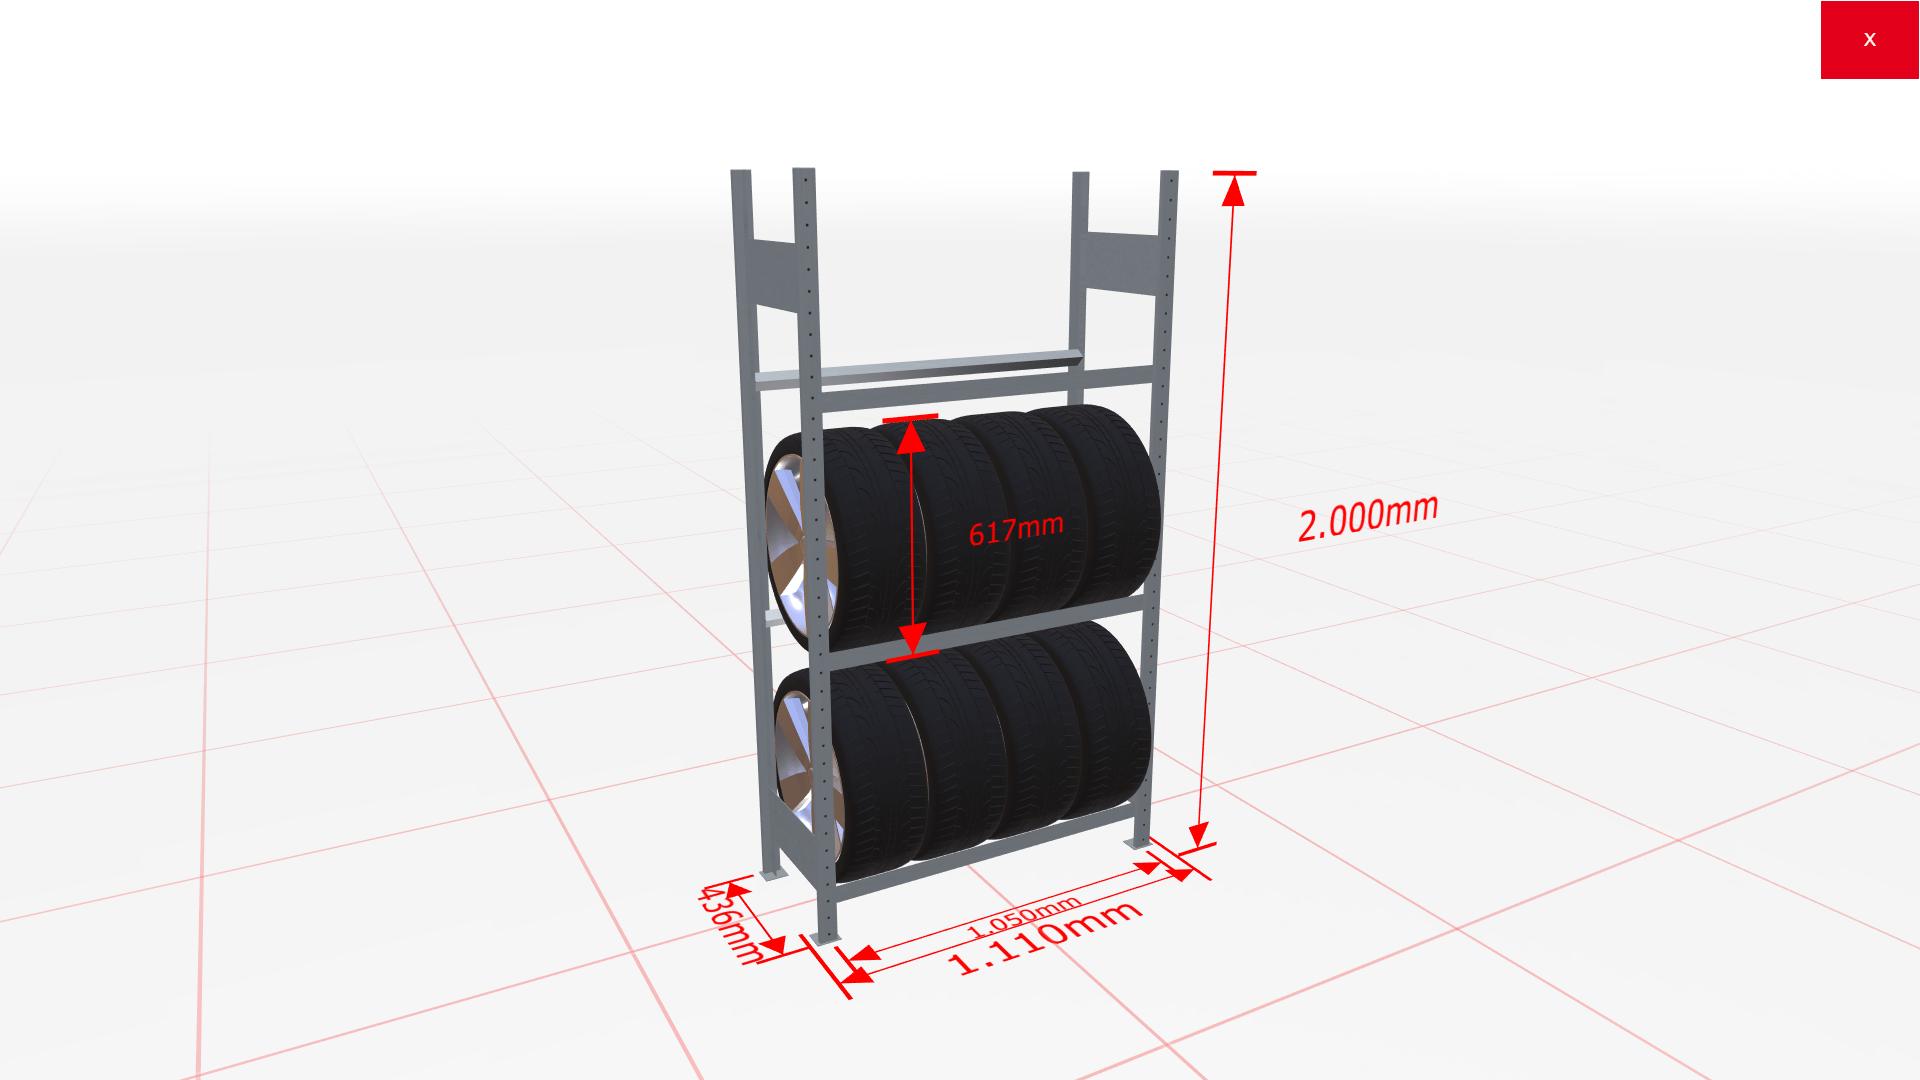 Räderregal Grundregal SCHULTE Lagertechnik 2000x1050x400 mm – 3 Ebenen á 1050 mm, verzinkt